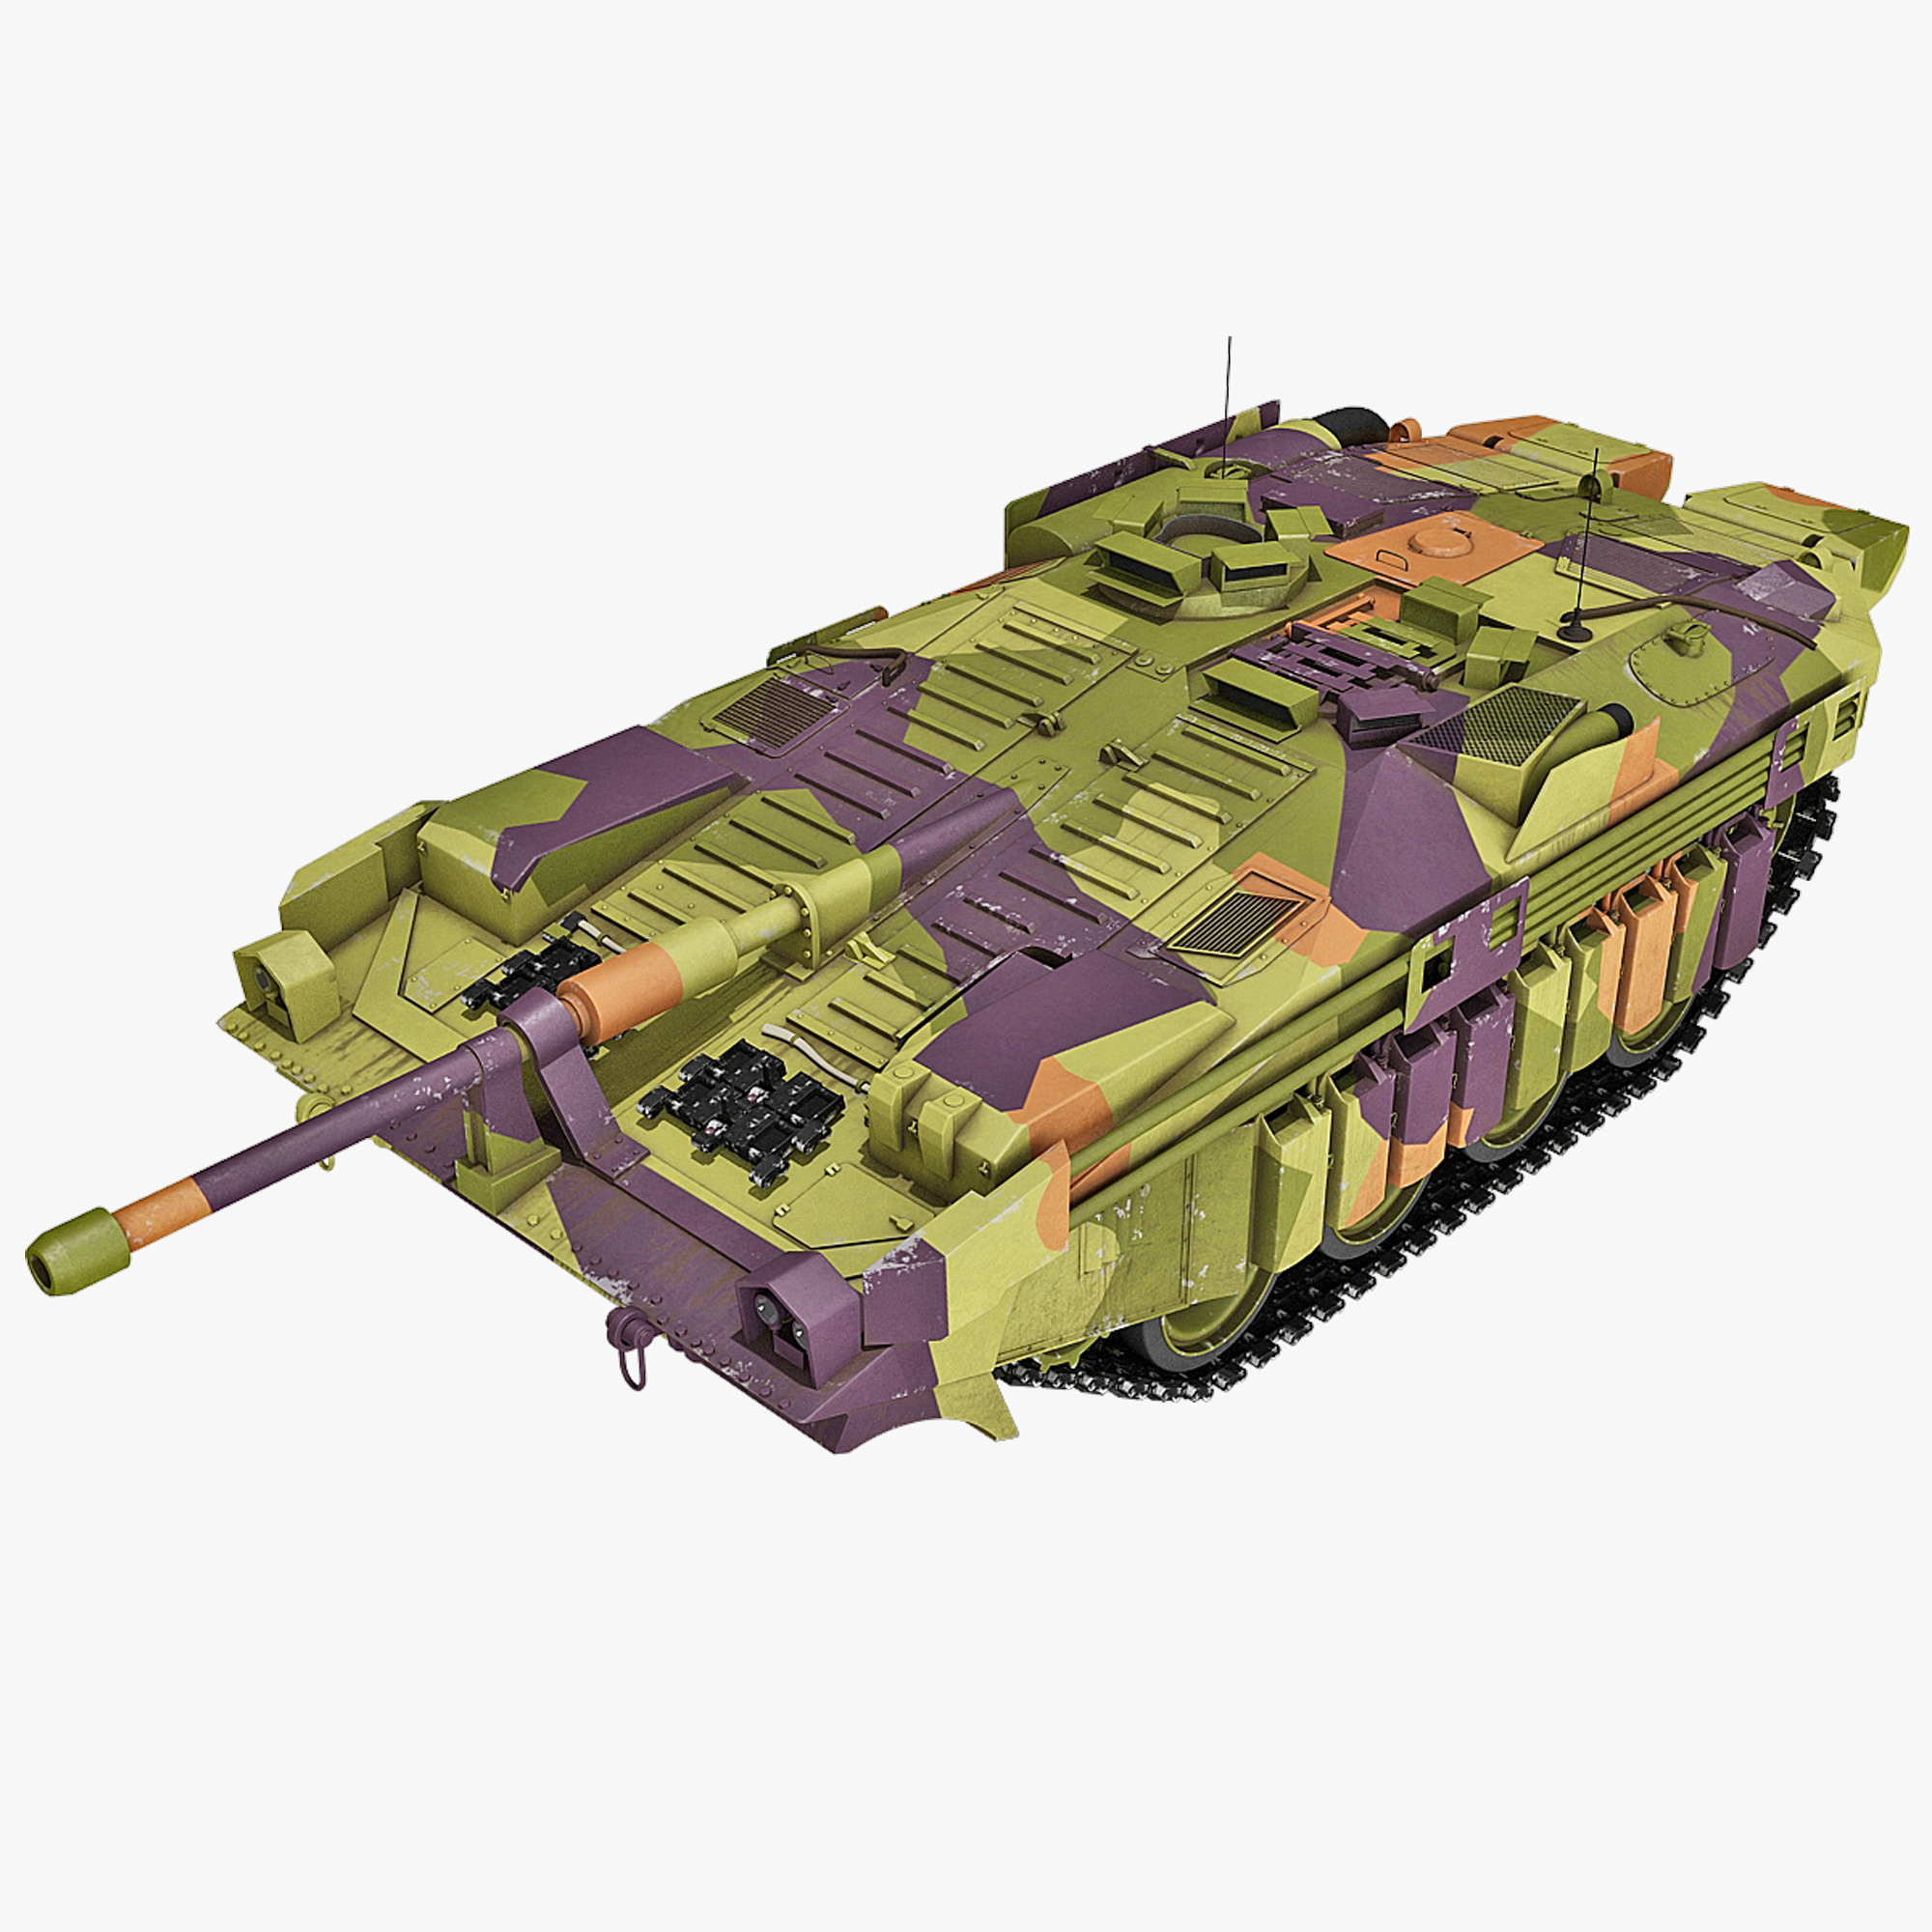 137770_Stridsvagn_103_Swedish_Battle_Tank_000.jpg